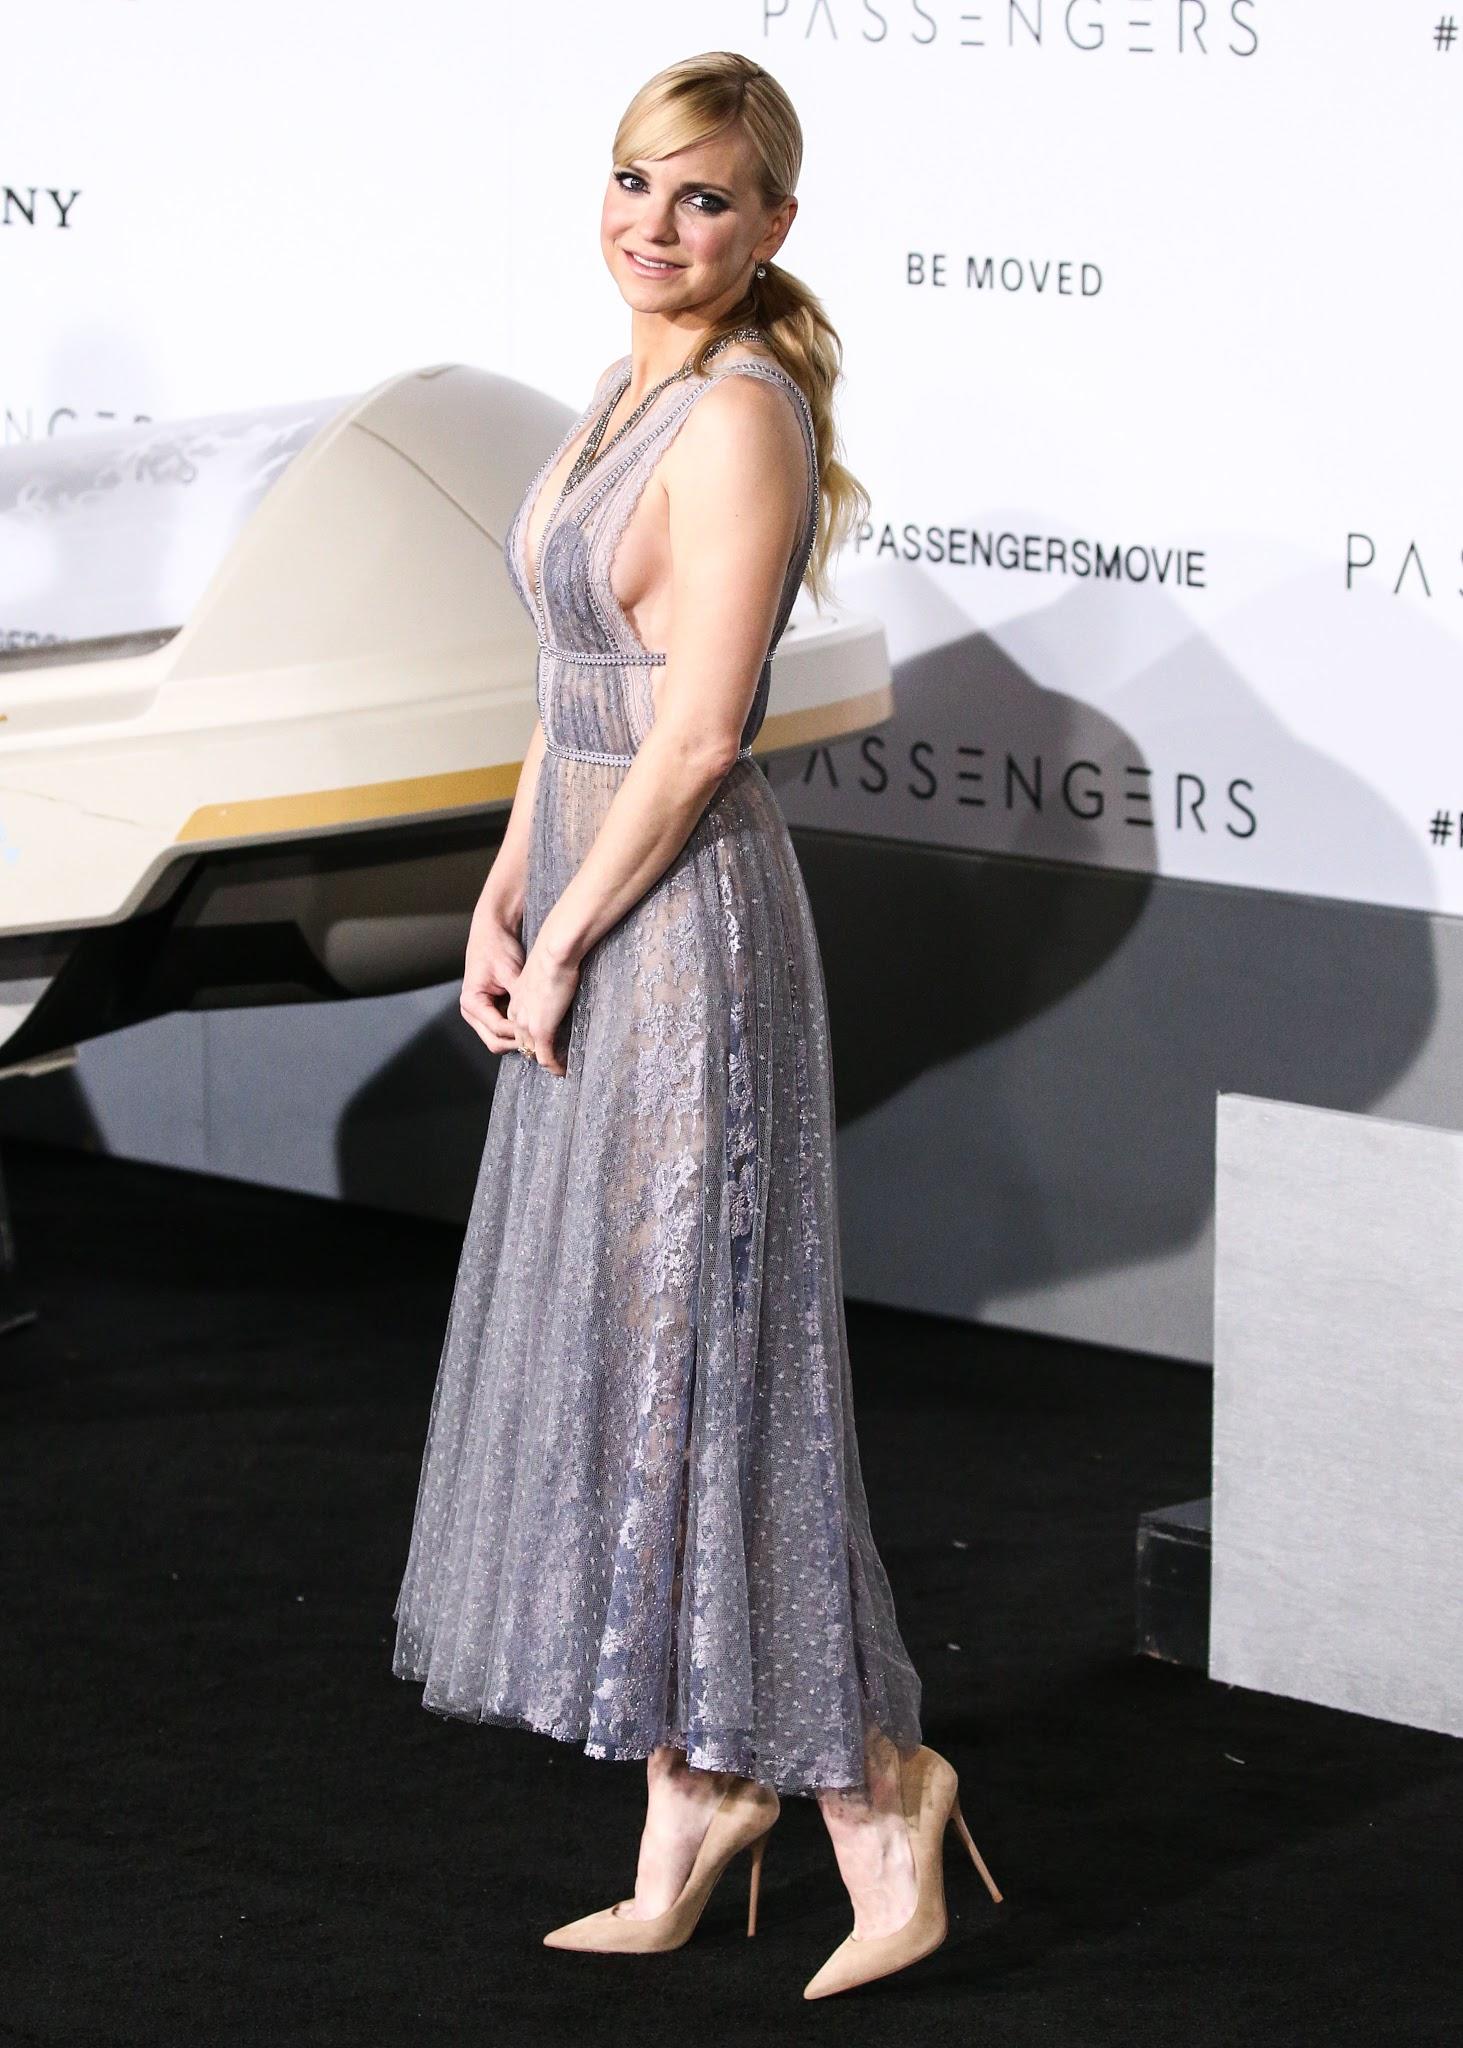 Cleavage Anna Faris nude (29 photo), Tits, Sideboobs, Twitter, legs 2020